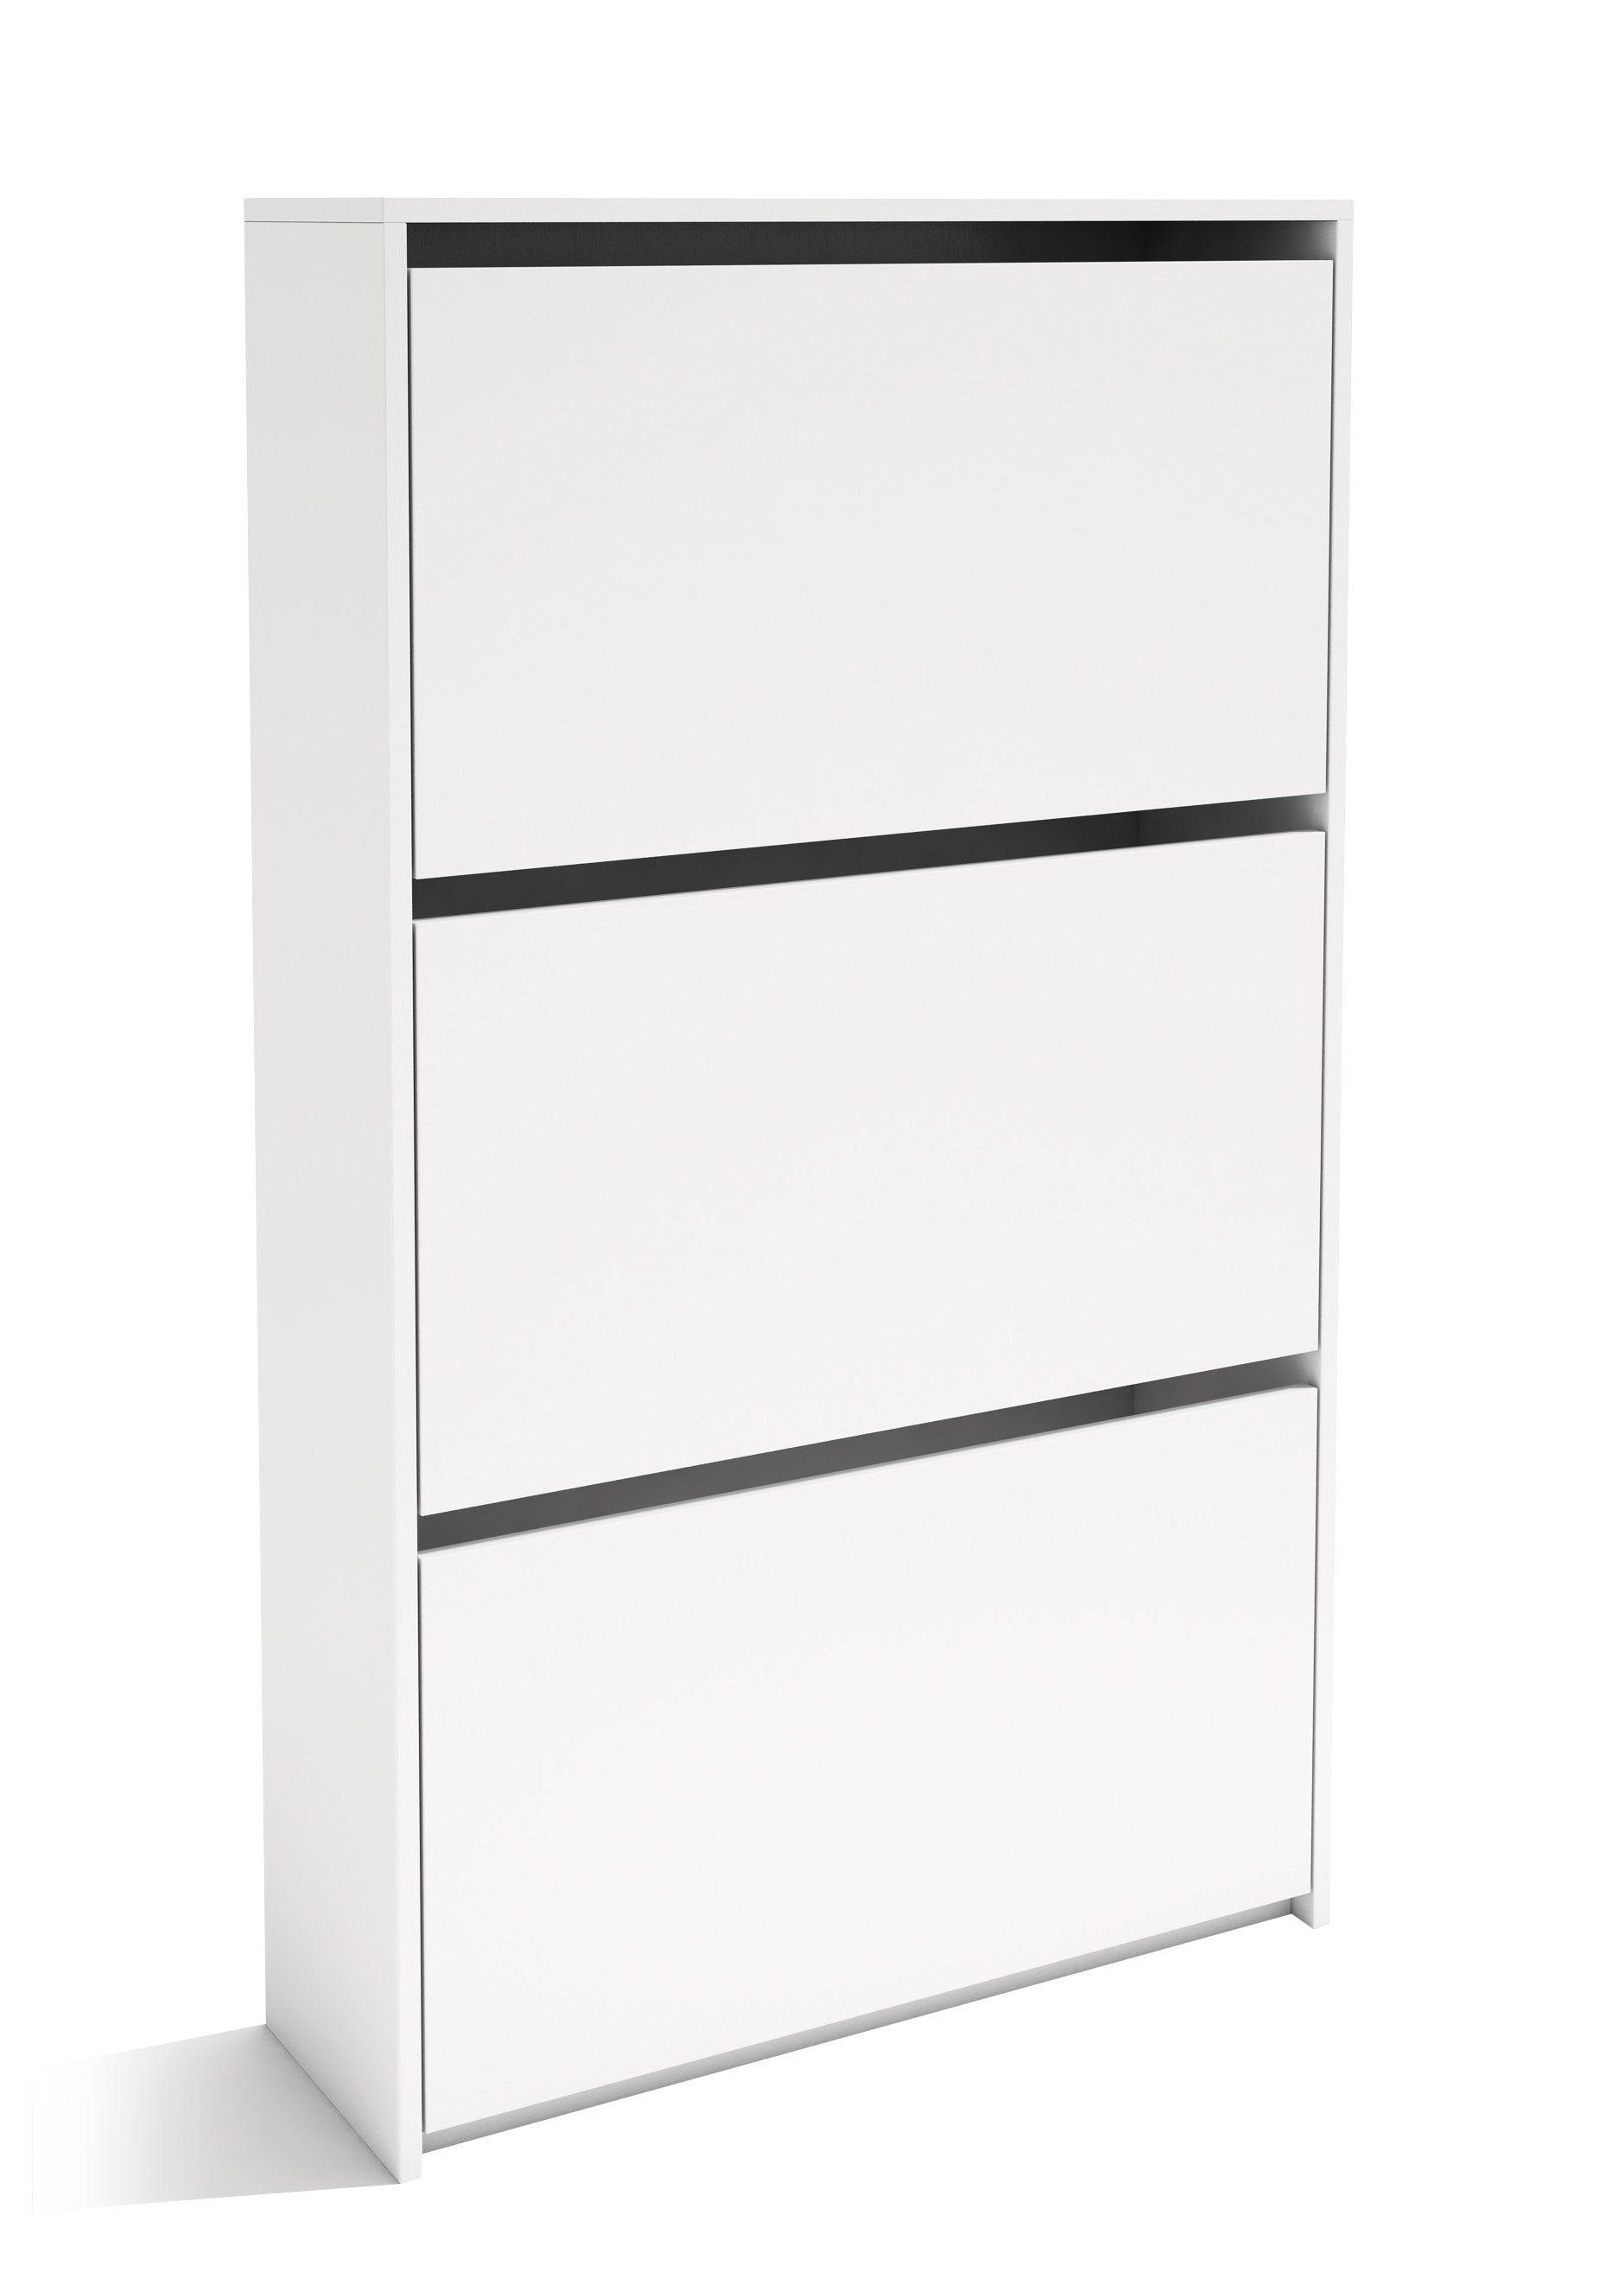 Comprar zapatero maine 3 puertas blanco escritorios for Zapatero pequeno blanco